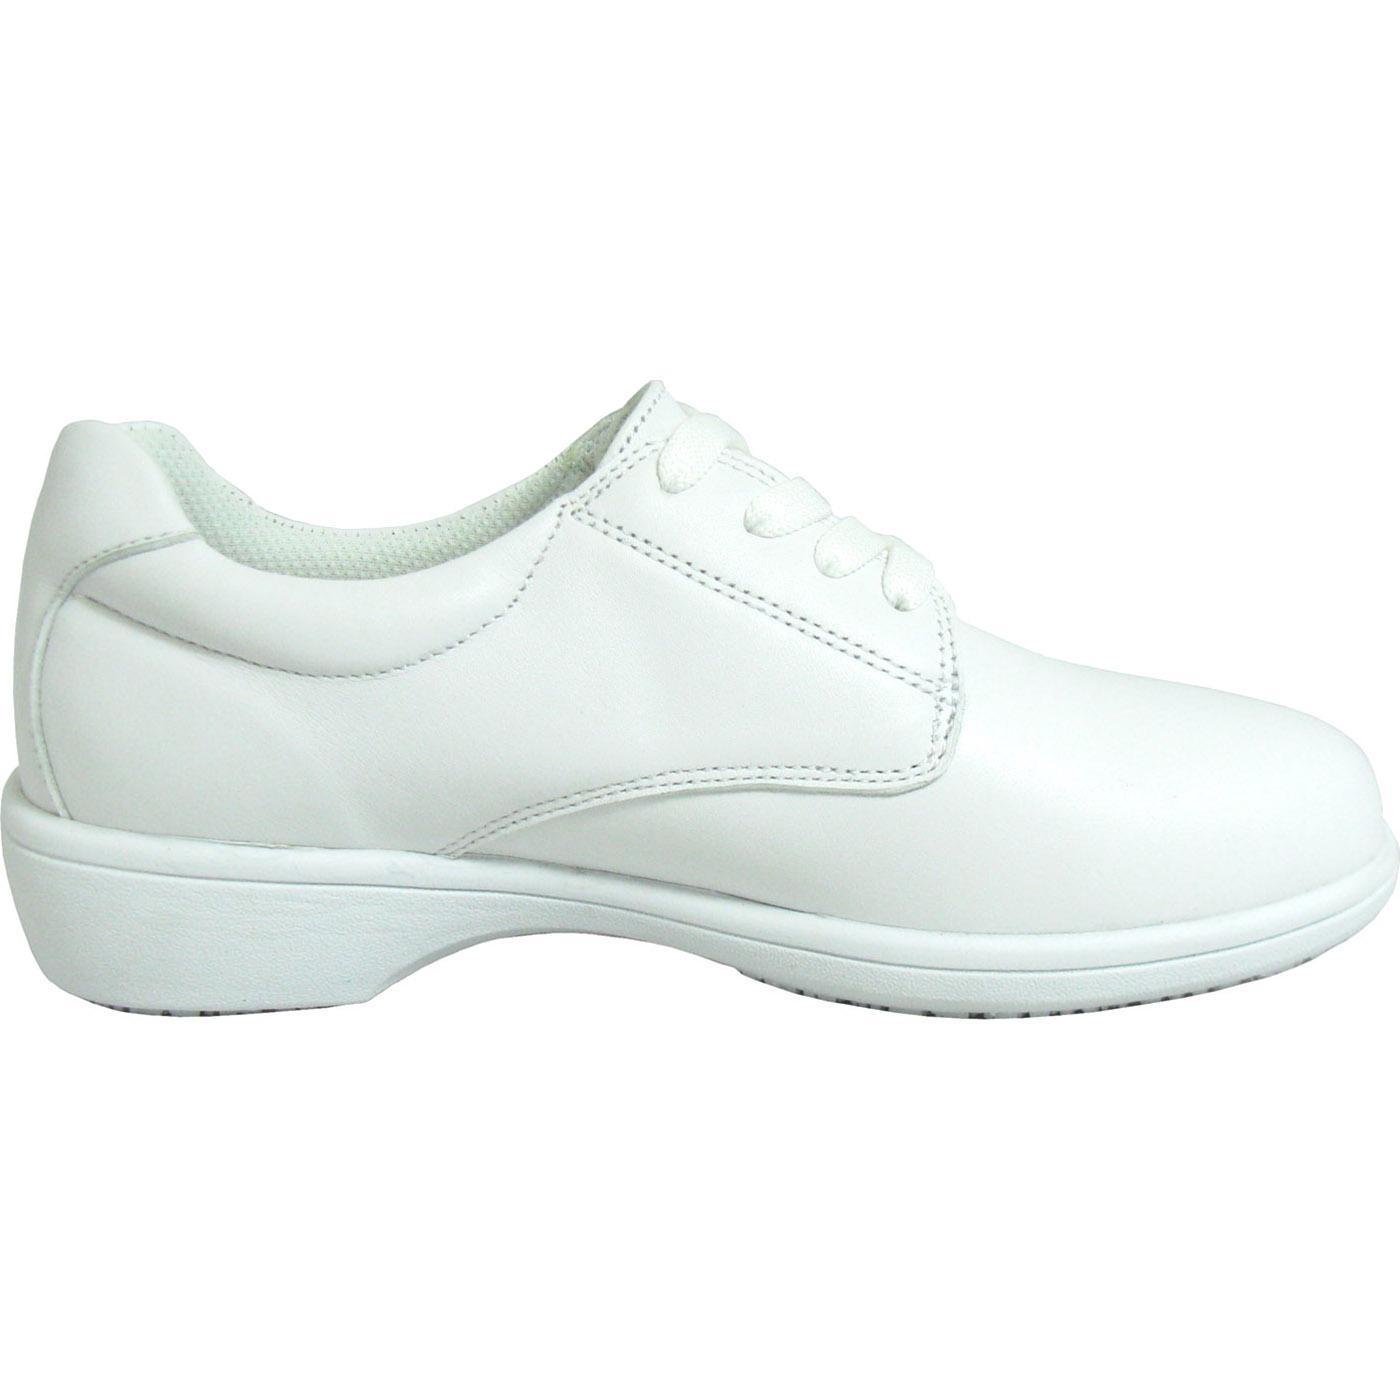 731dd95c85 Genuine Grip Women s Slip-Resistant Oxford